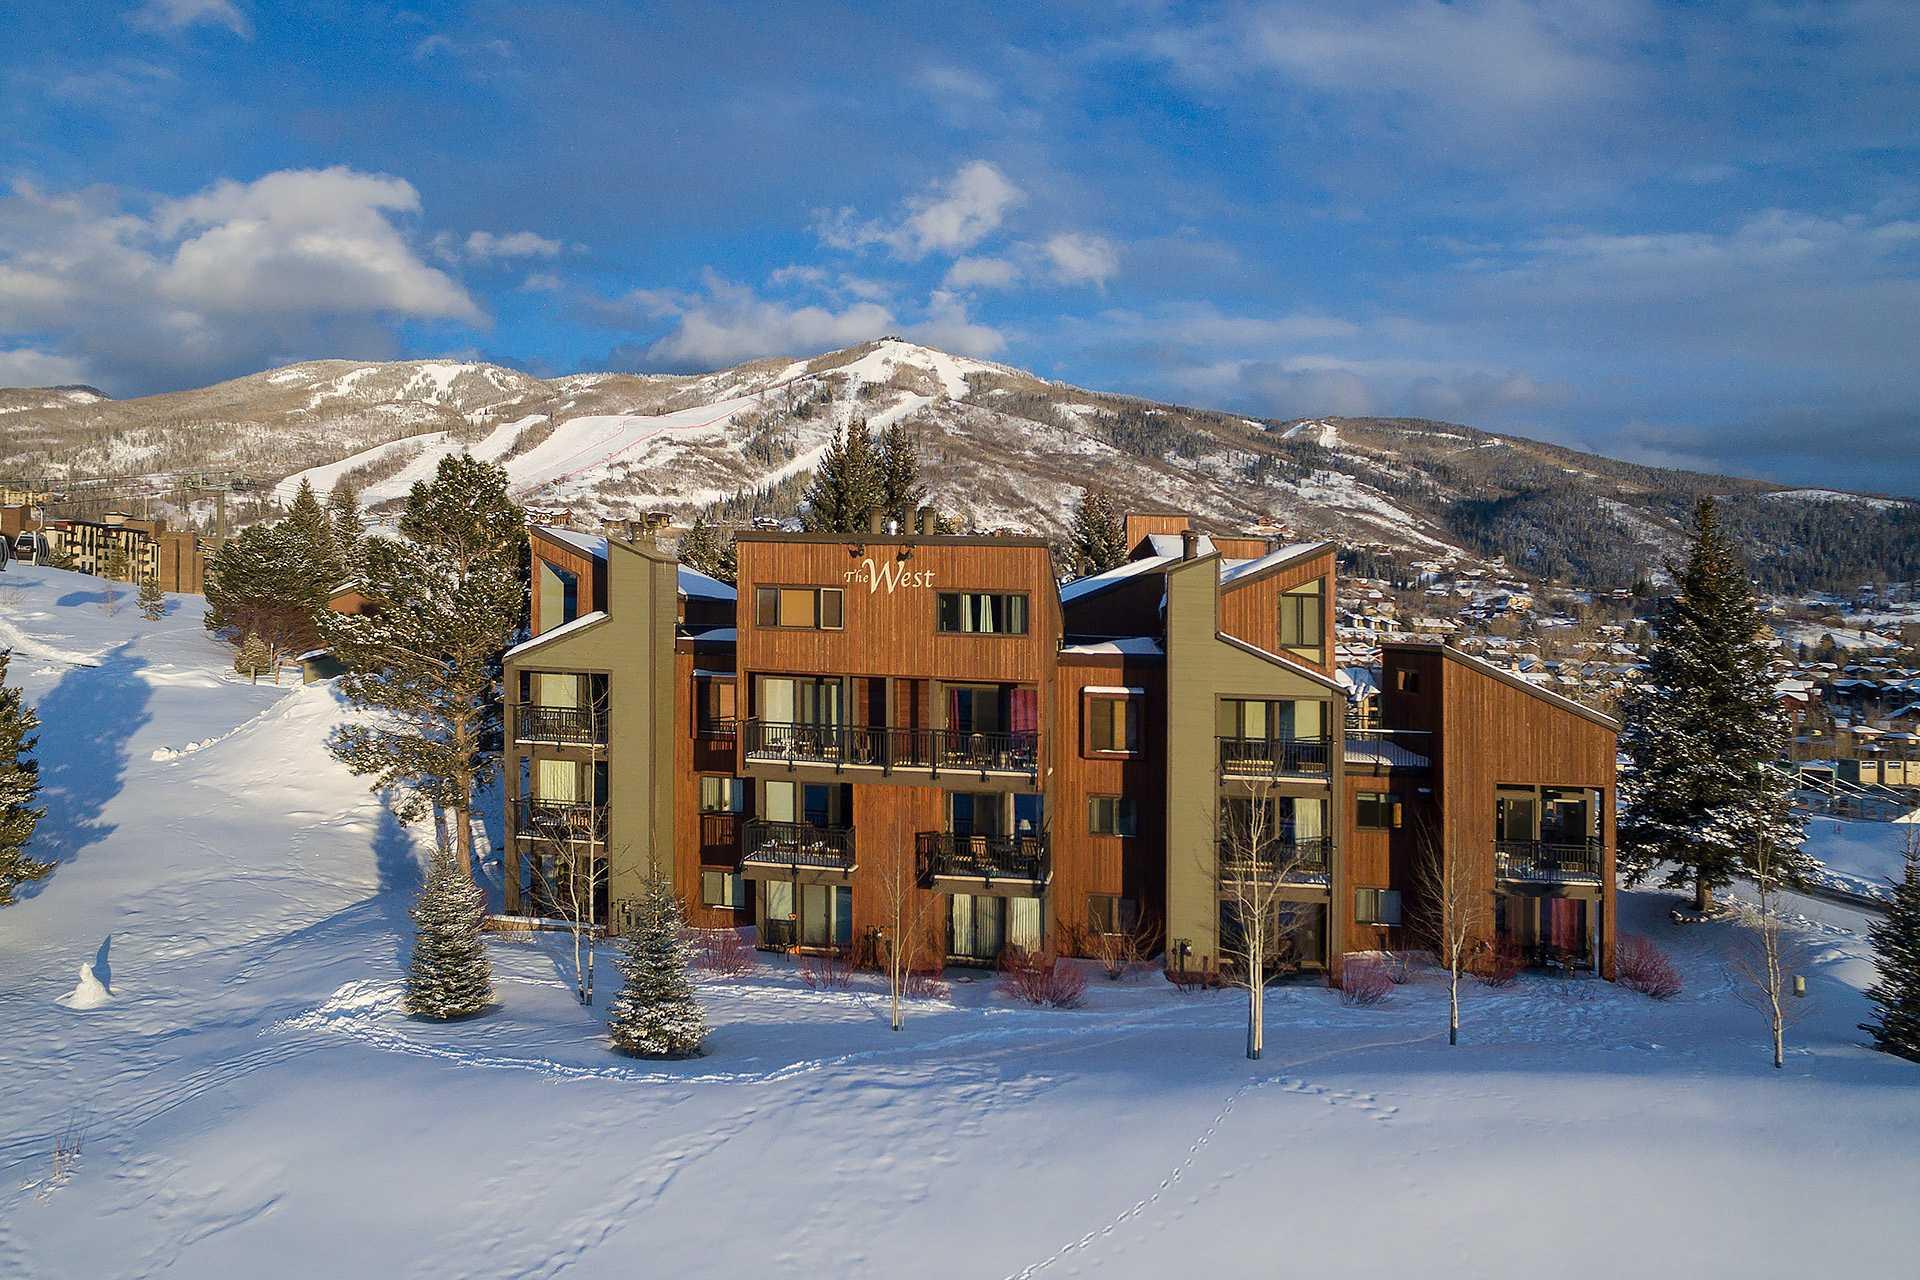 W3222: The West Condominiums